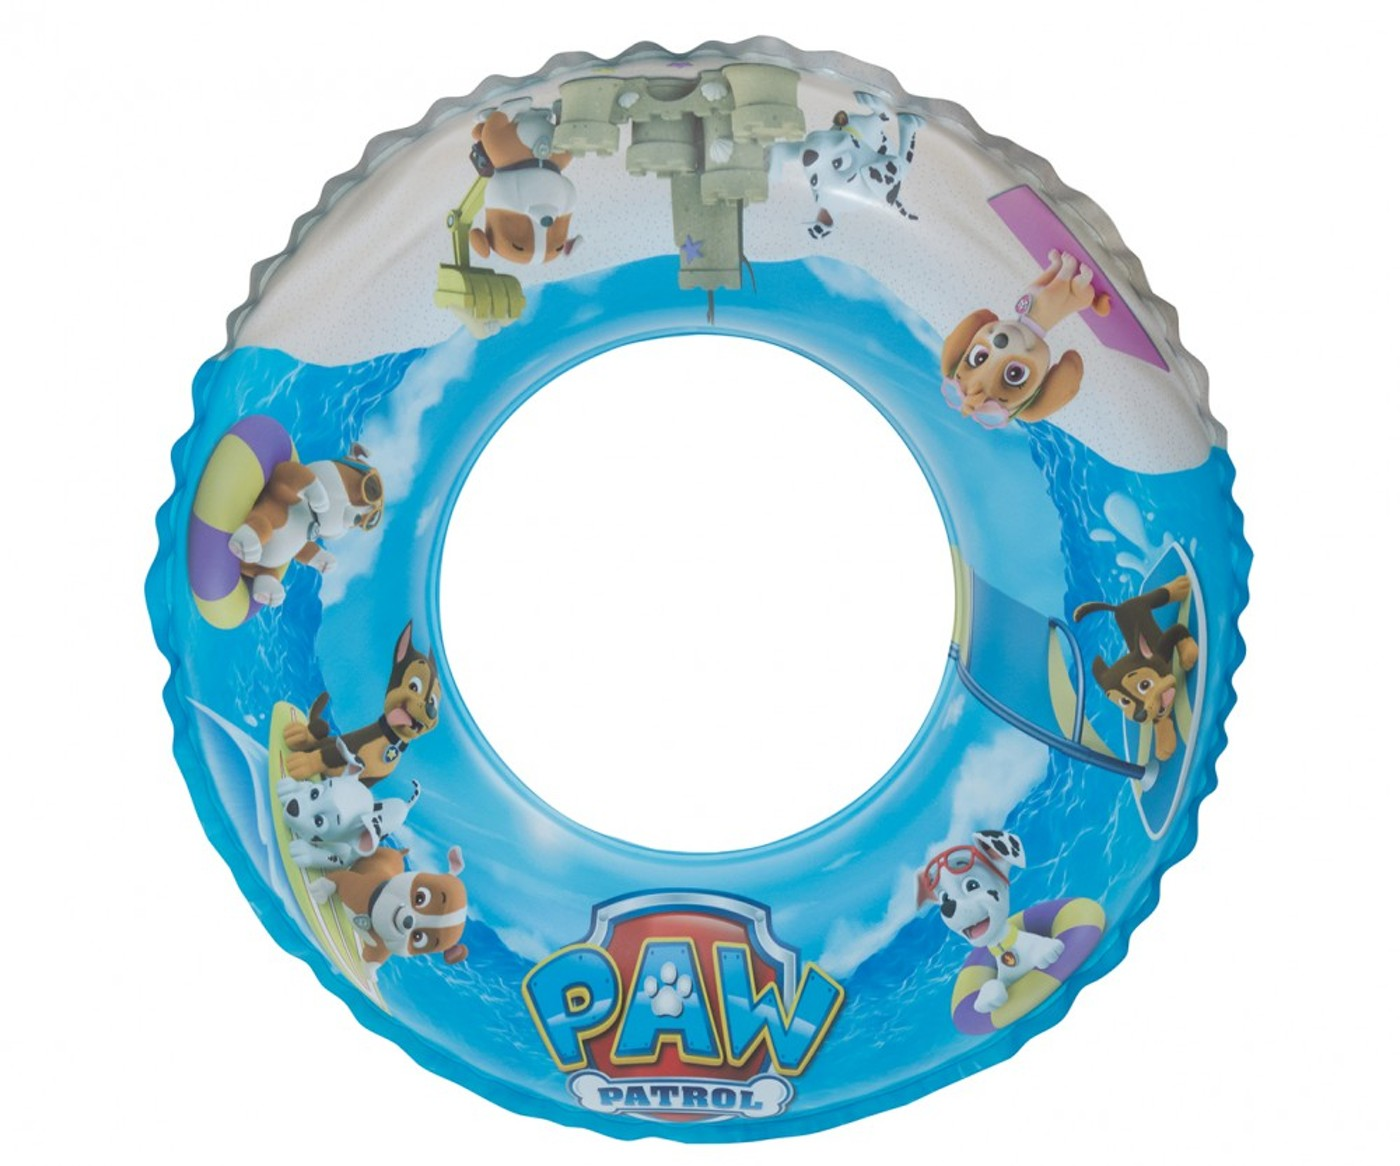 HAPPY PEOPLE Paw Patrol Schwimmring - Kinder